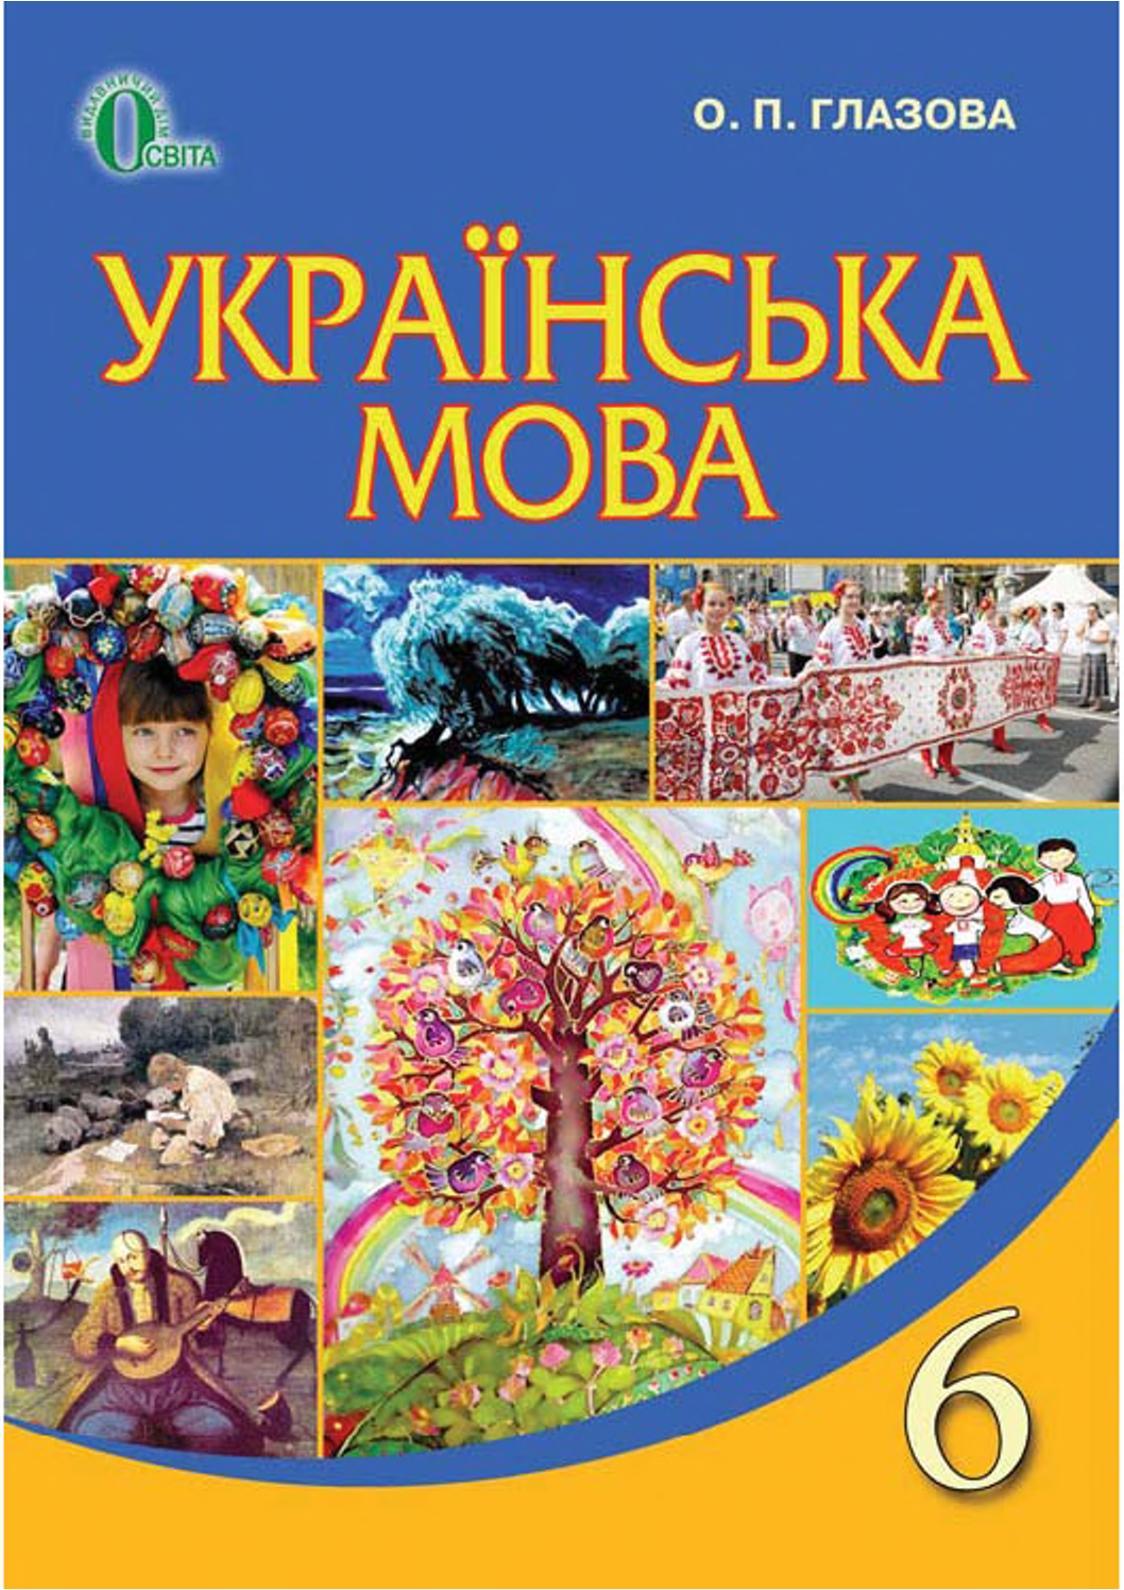 Calaméo - 6 клас. Українська мова (Глазова) - 2014 1bf6e7a9aad46